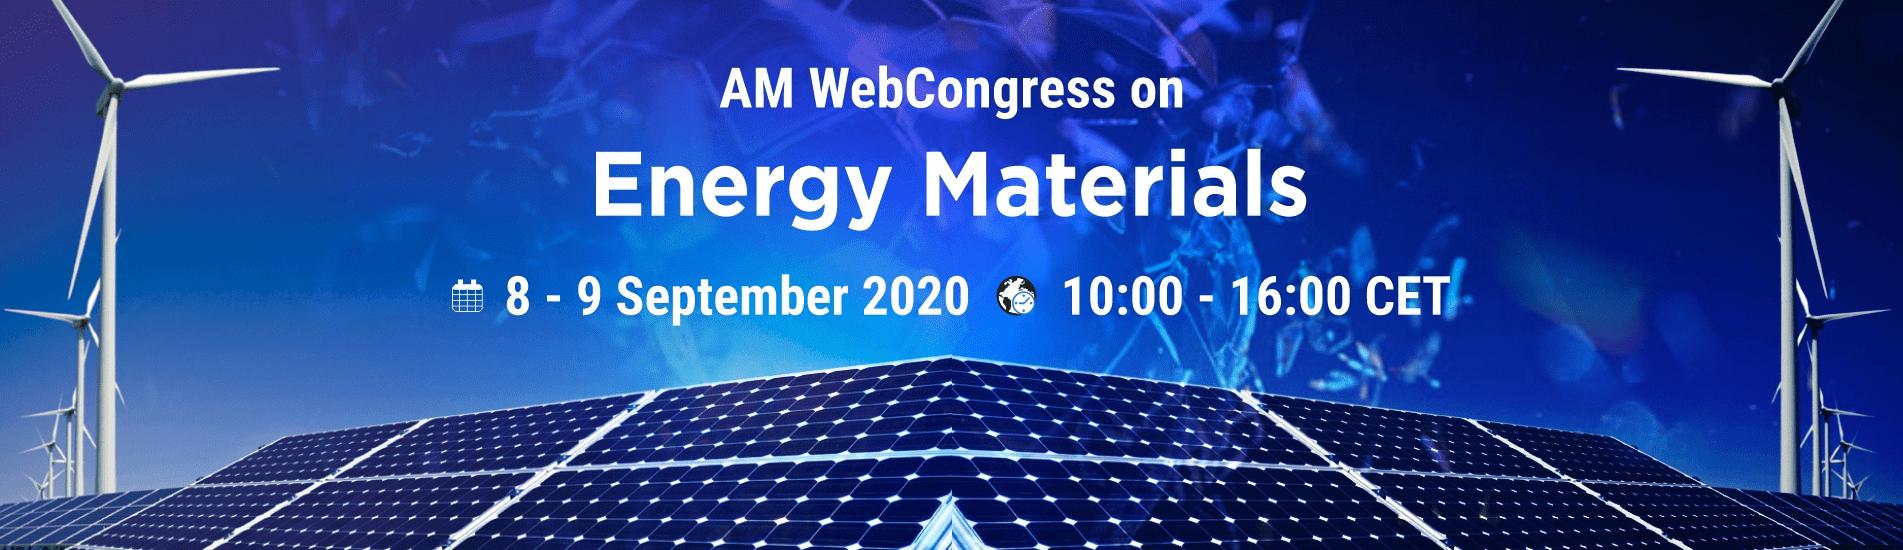 WebCongress on Energy Materials | AMWeb | IAAM